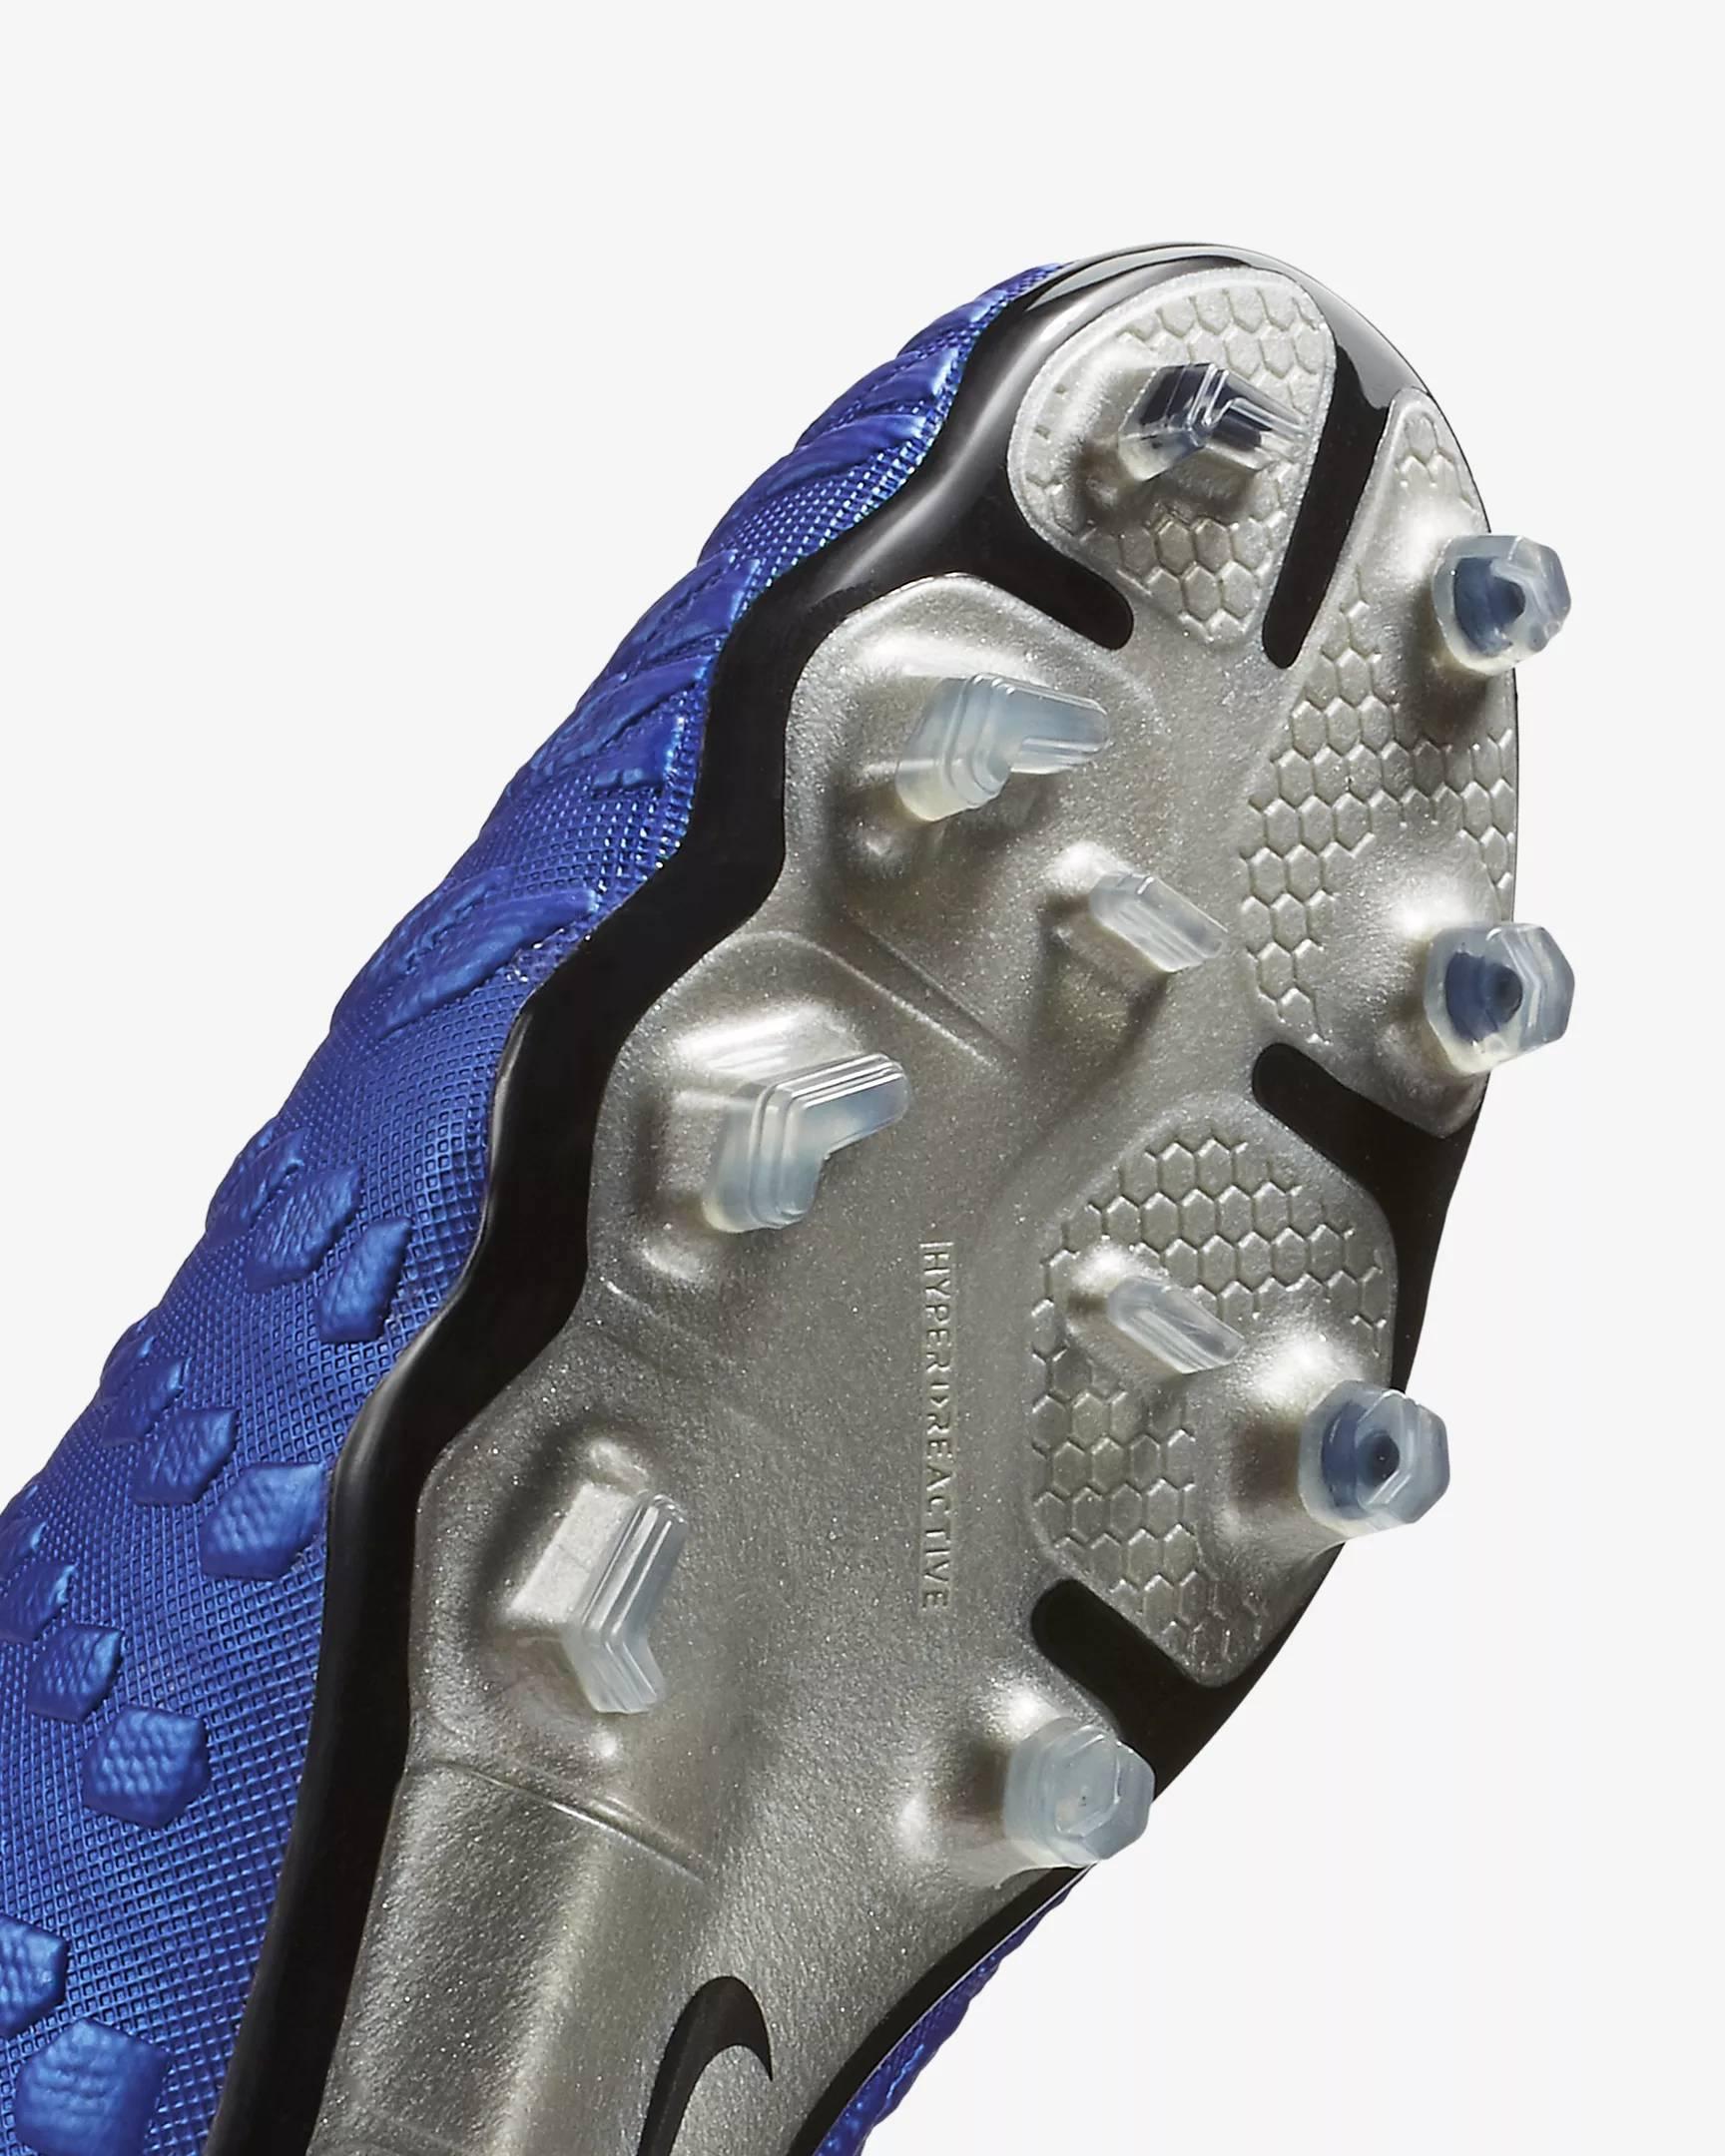 aaffc59e4de ... Click to enlarge image  nike hypervenom iii elite dynamic fit fg always forward racer blue black volt metallic silver g.jpg  ...